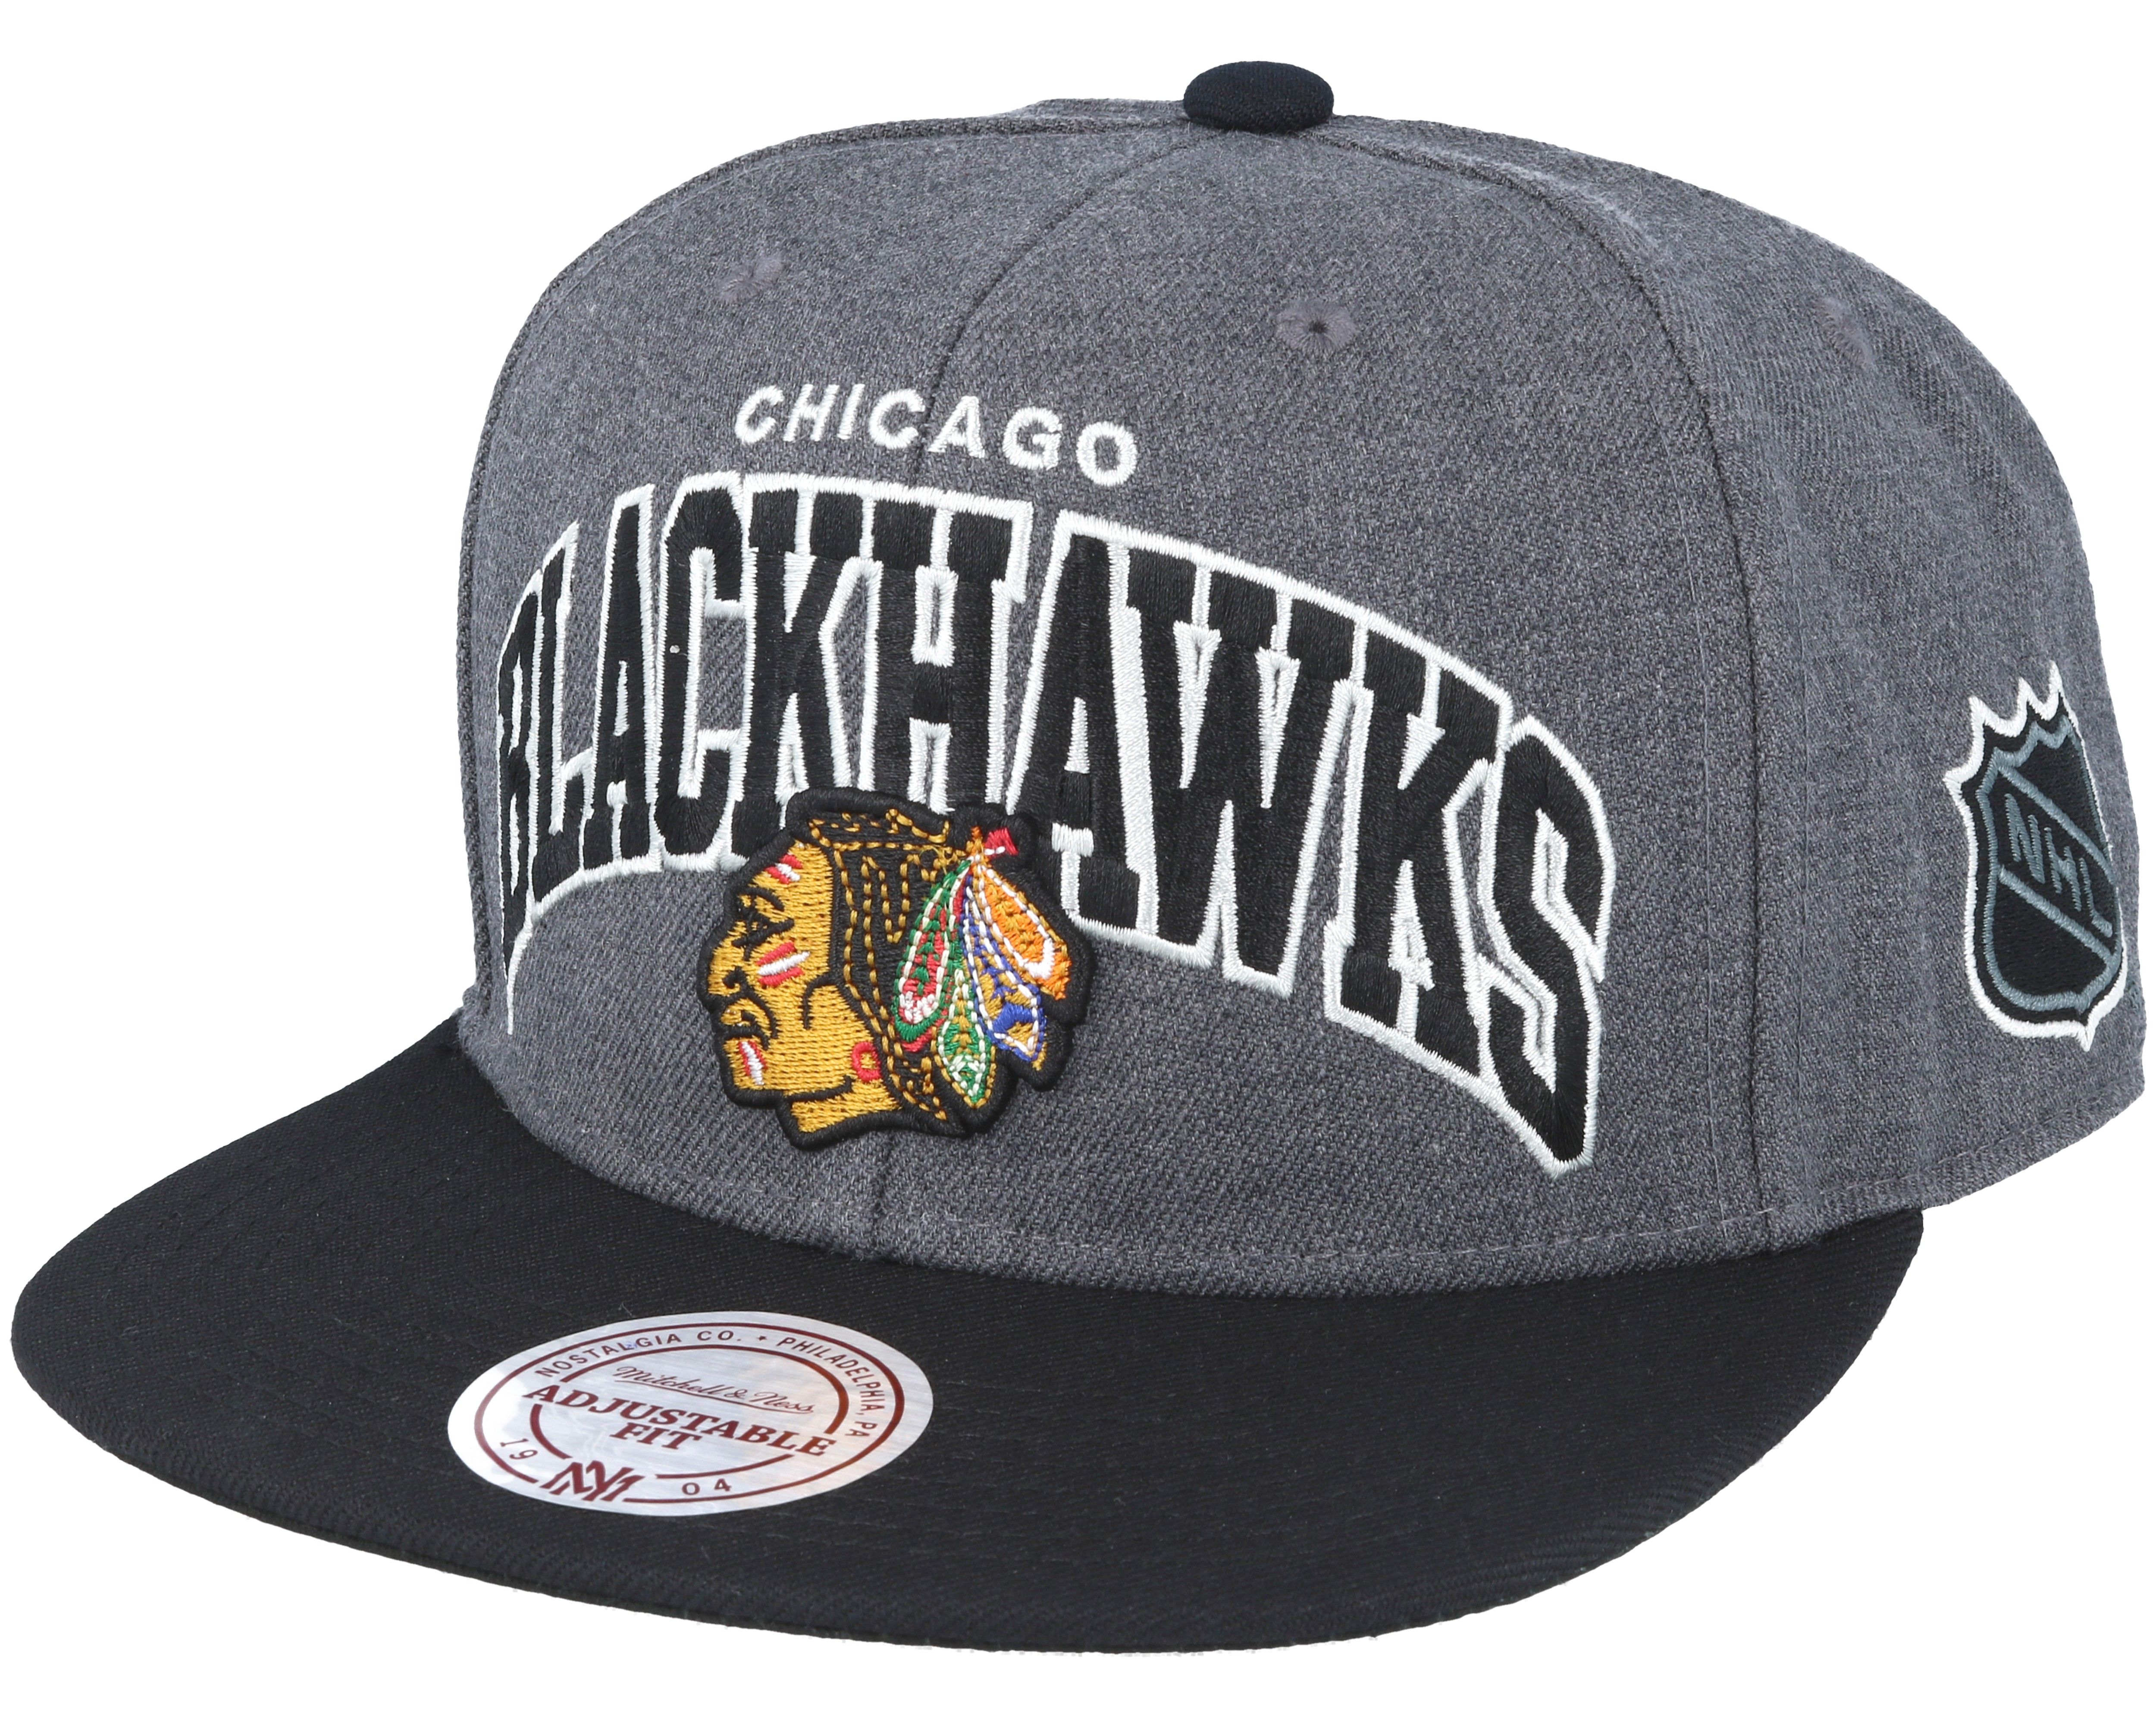 Chicago Blackhawks G2 Team Arch Snapback Mitchell Amp Ness